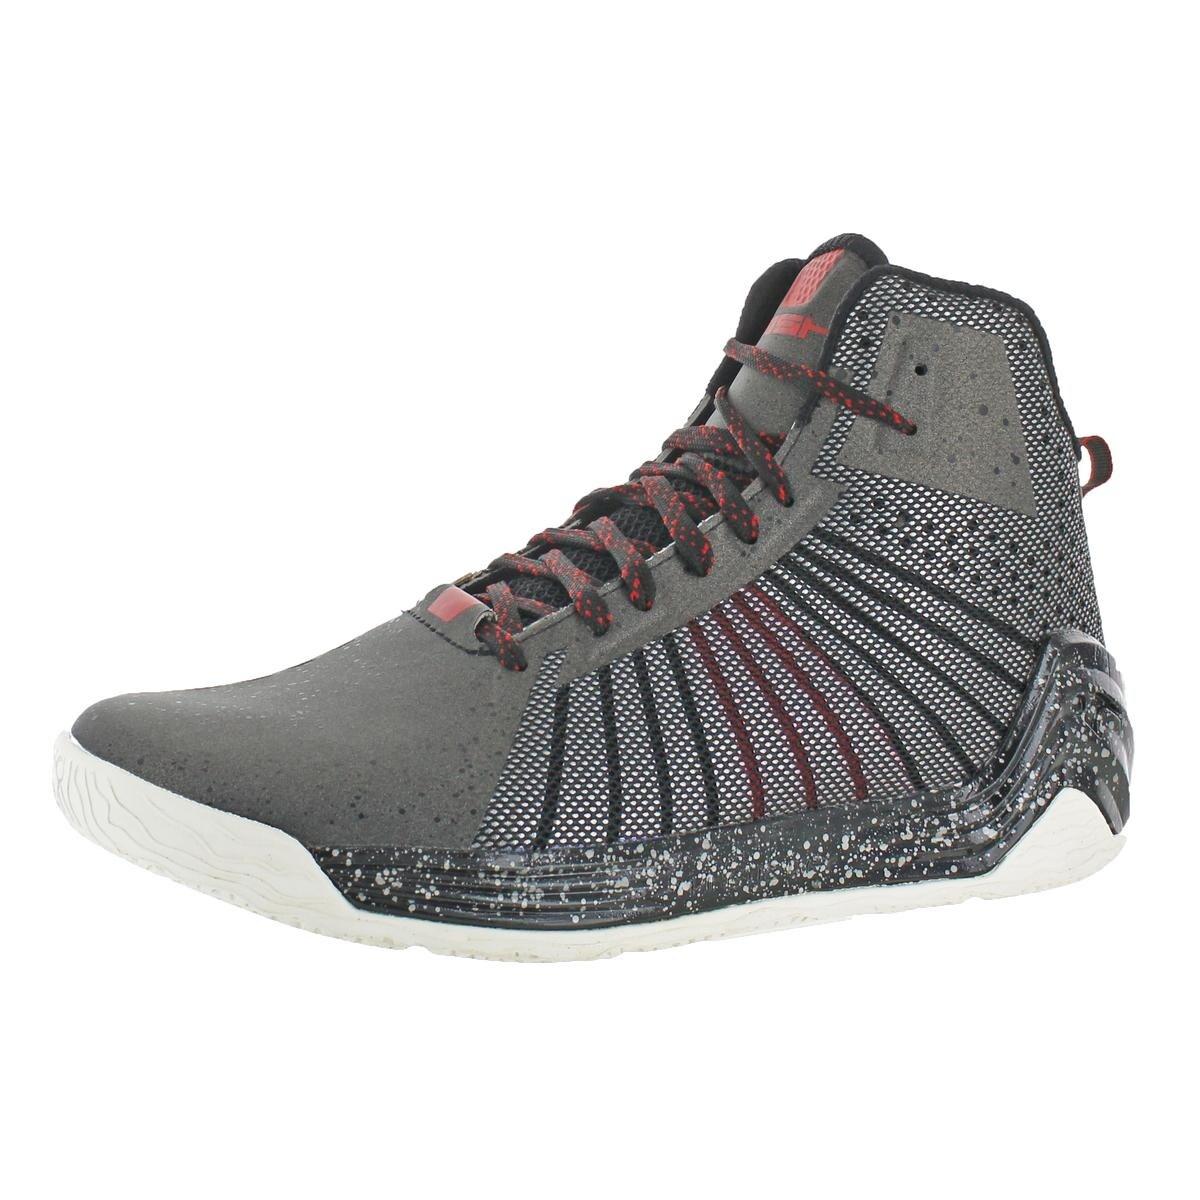 Reebok Mens Instapump Fury OB Cut Out Lightweight Basketball Shoes